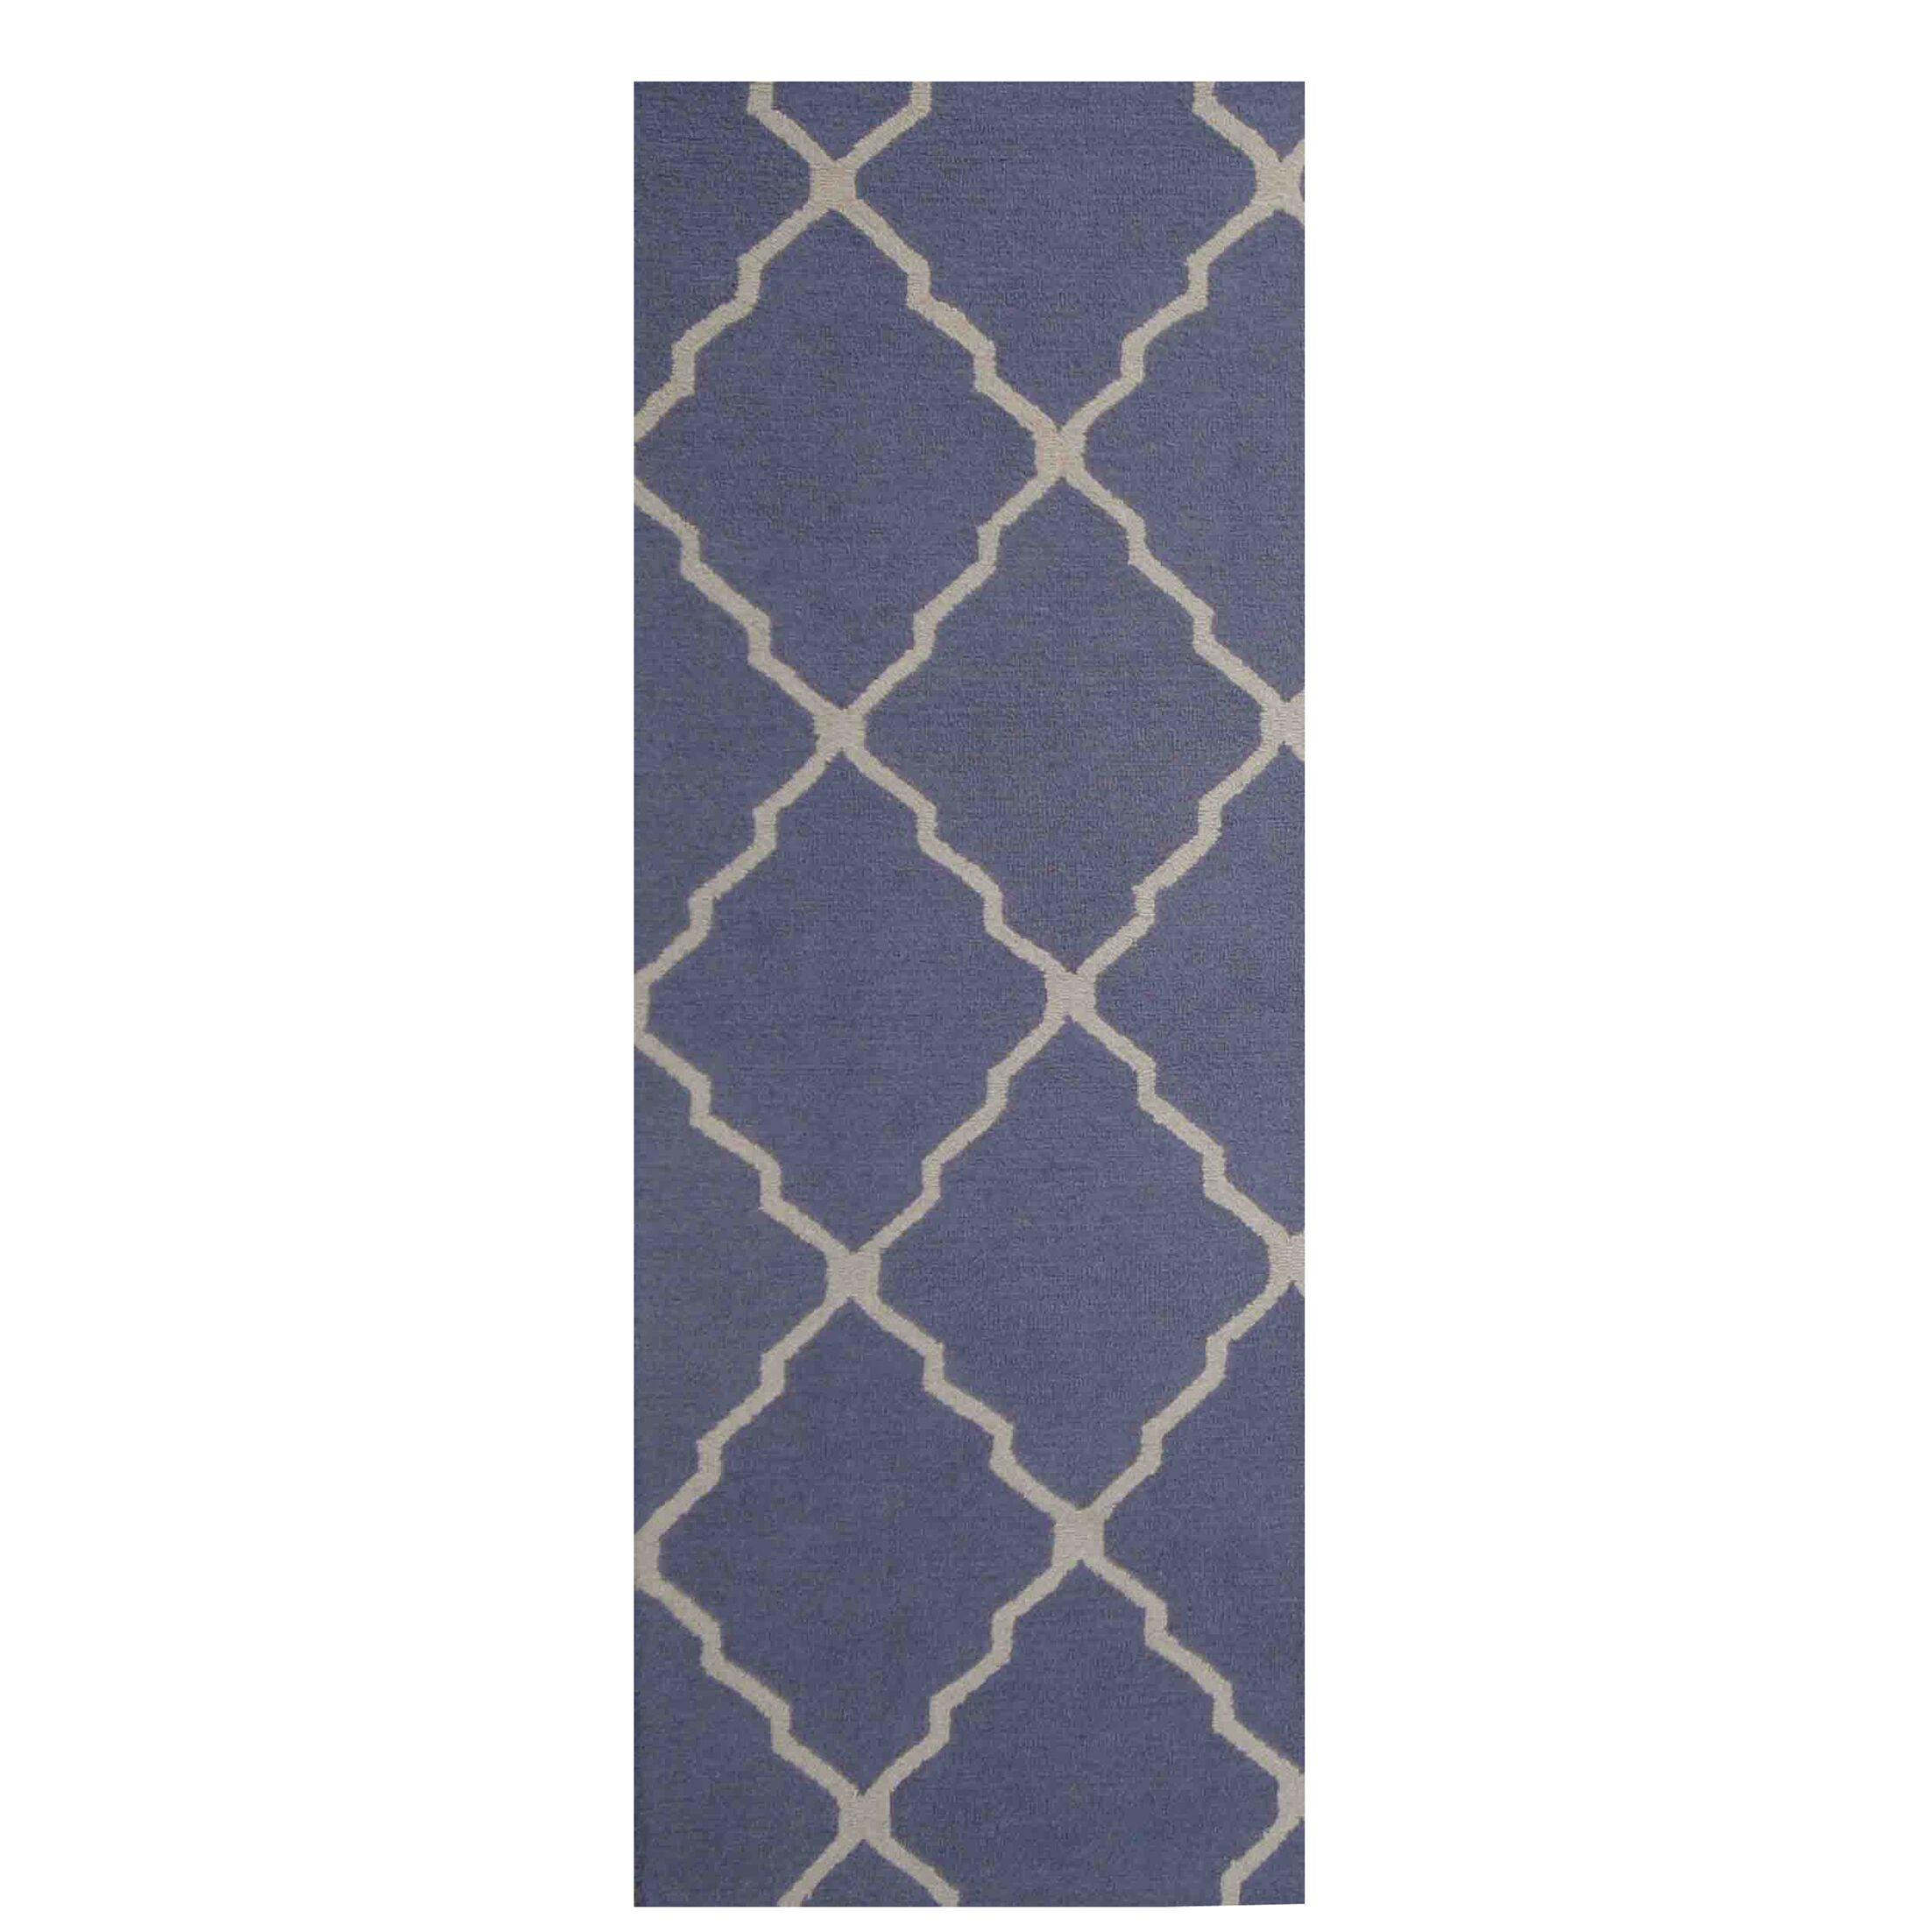 Hand-Tufted Blue/Ivory Indoor Area Rug Rug Size: Runner 2'6